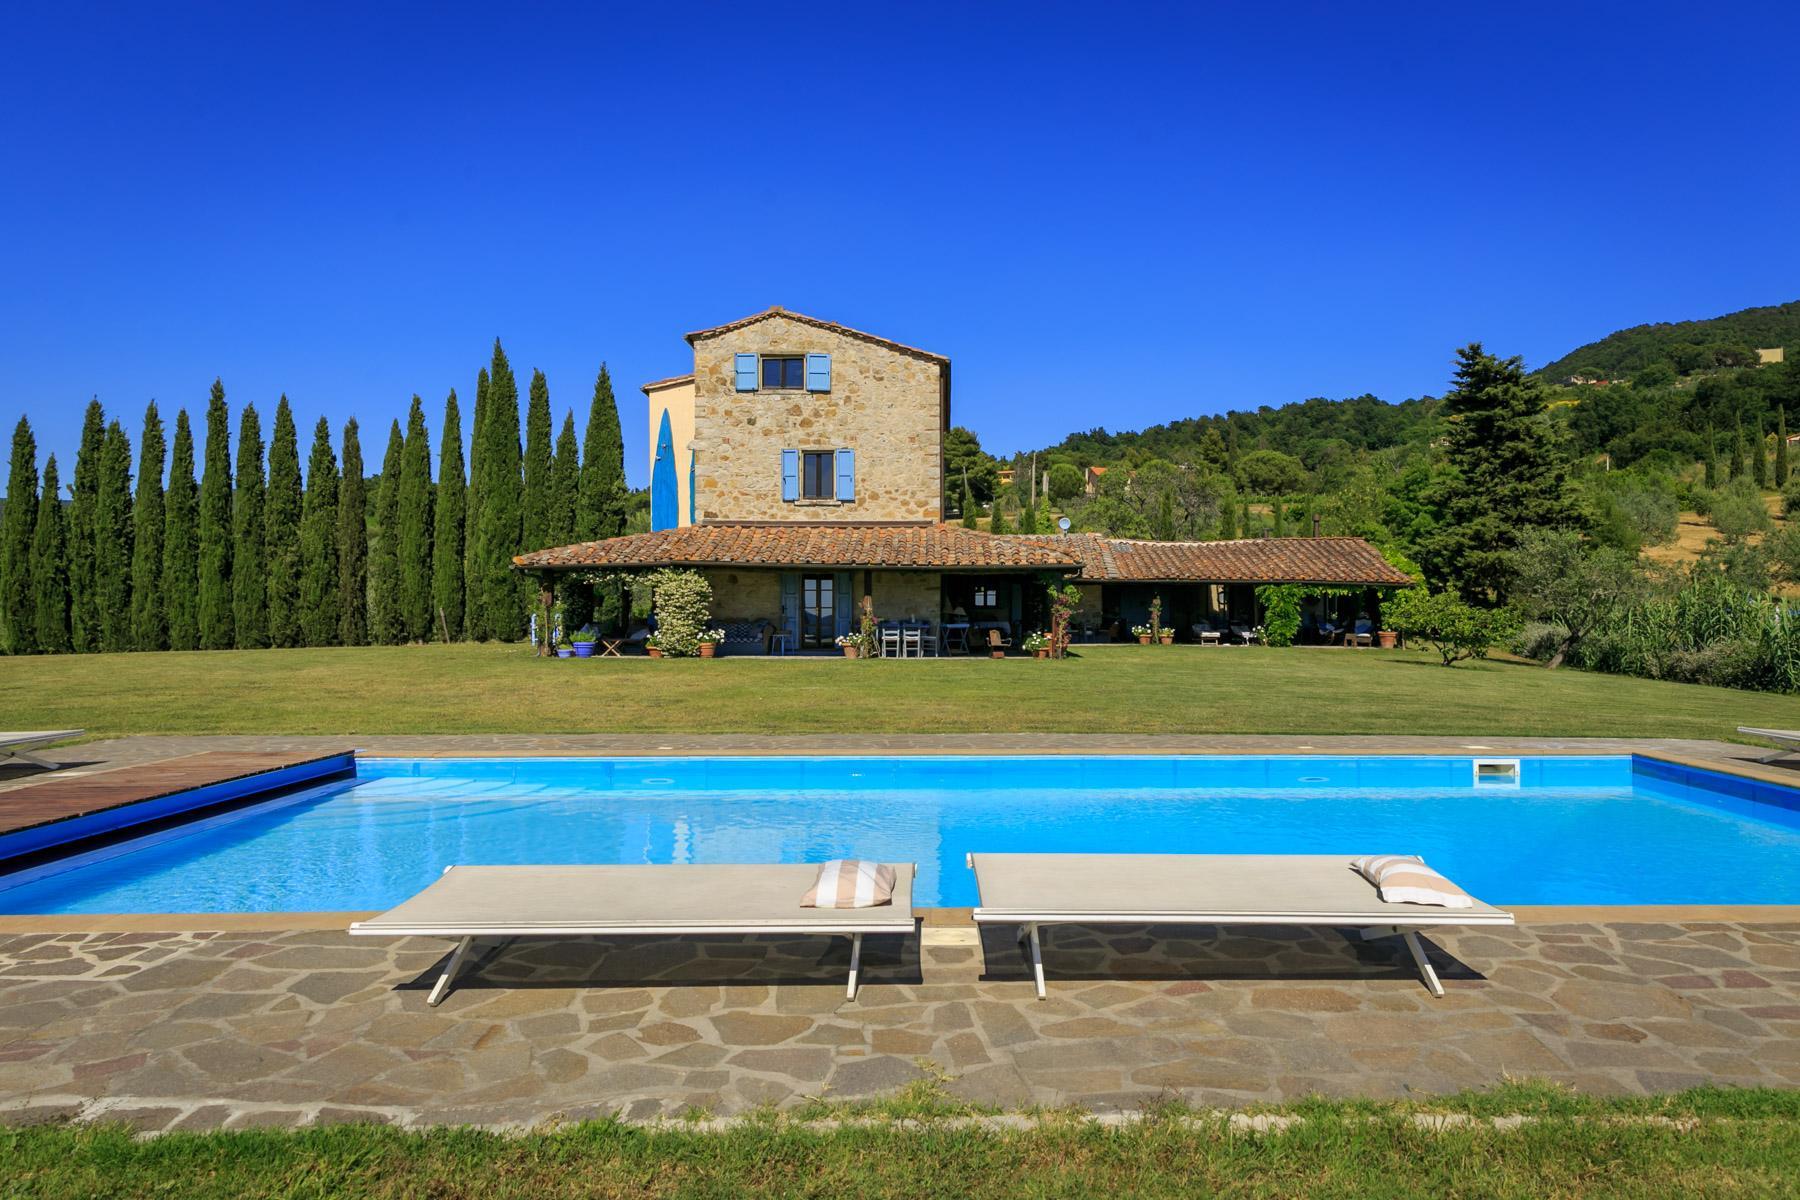 Belle villa toscane avec piscine - 2